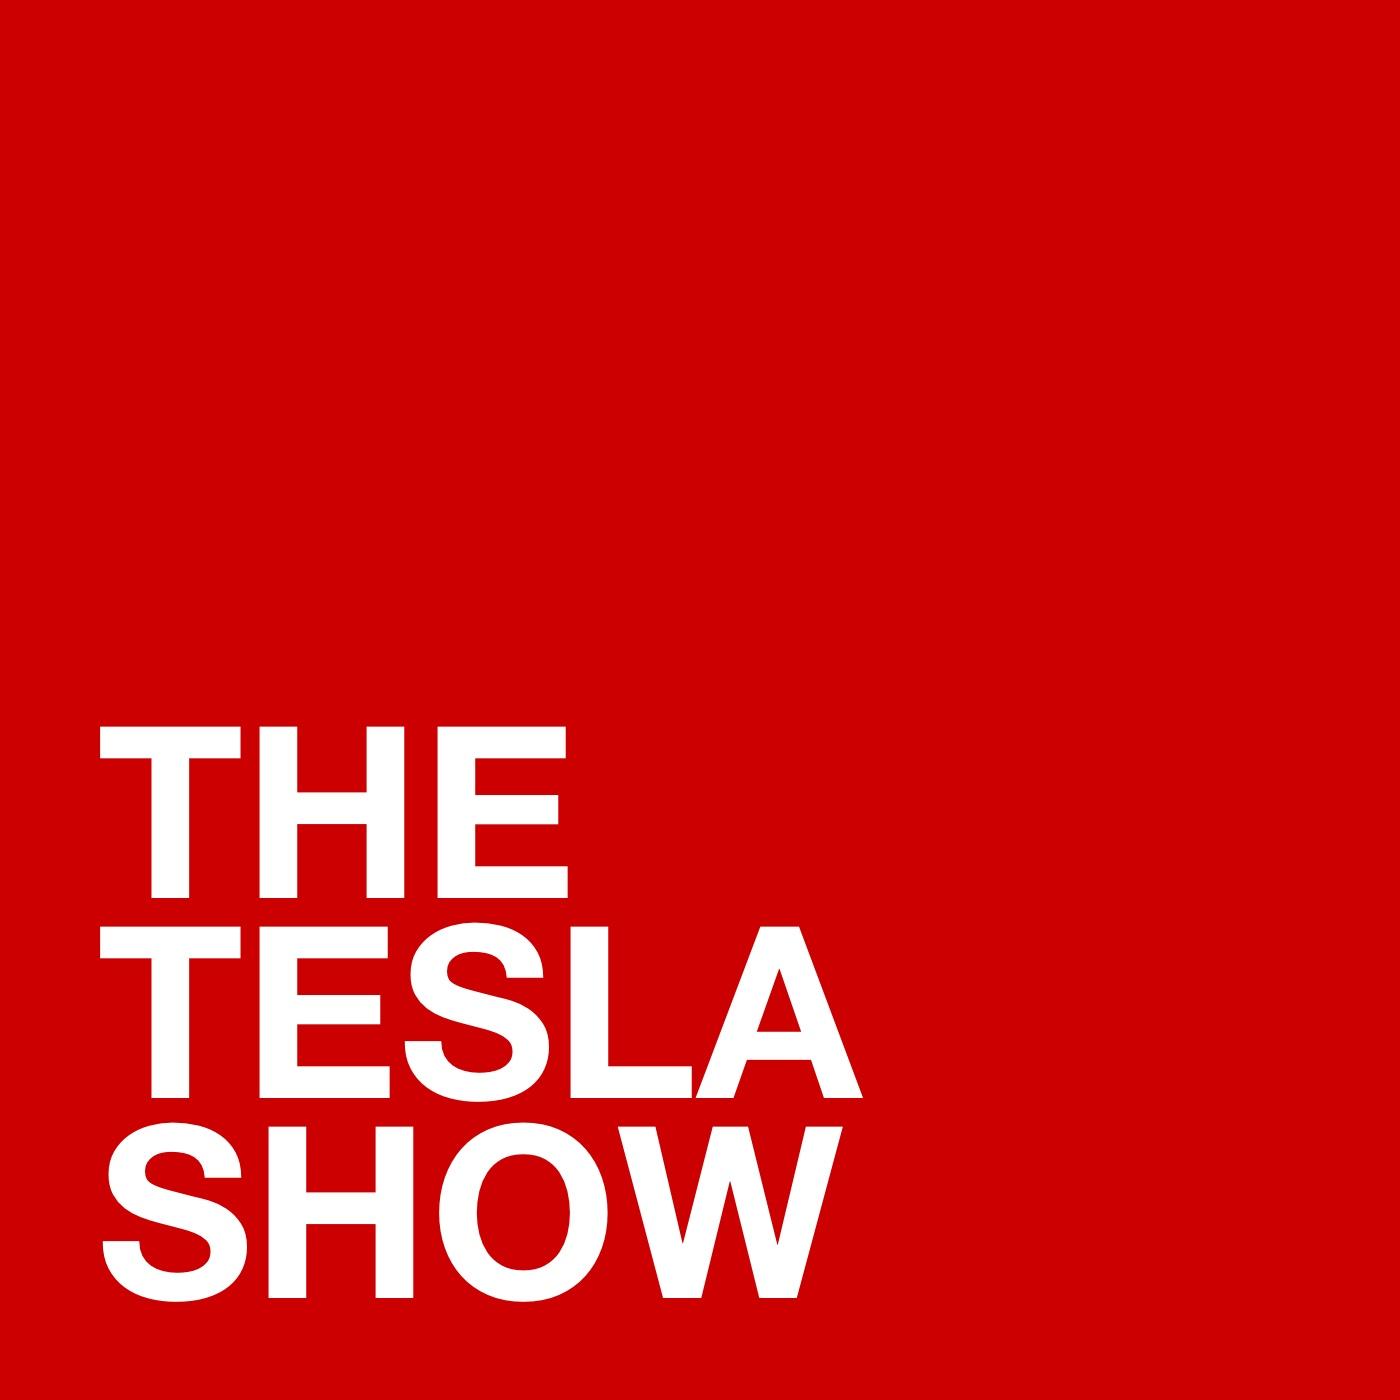 The Tesla Show